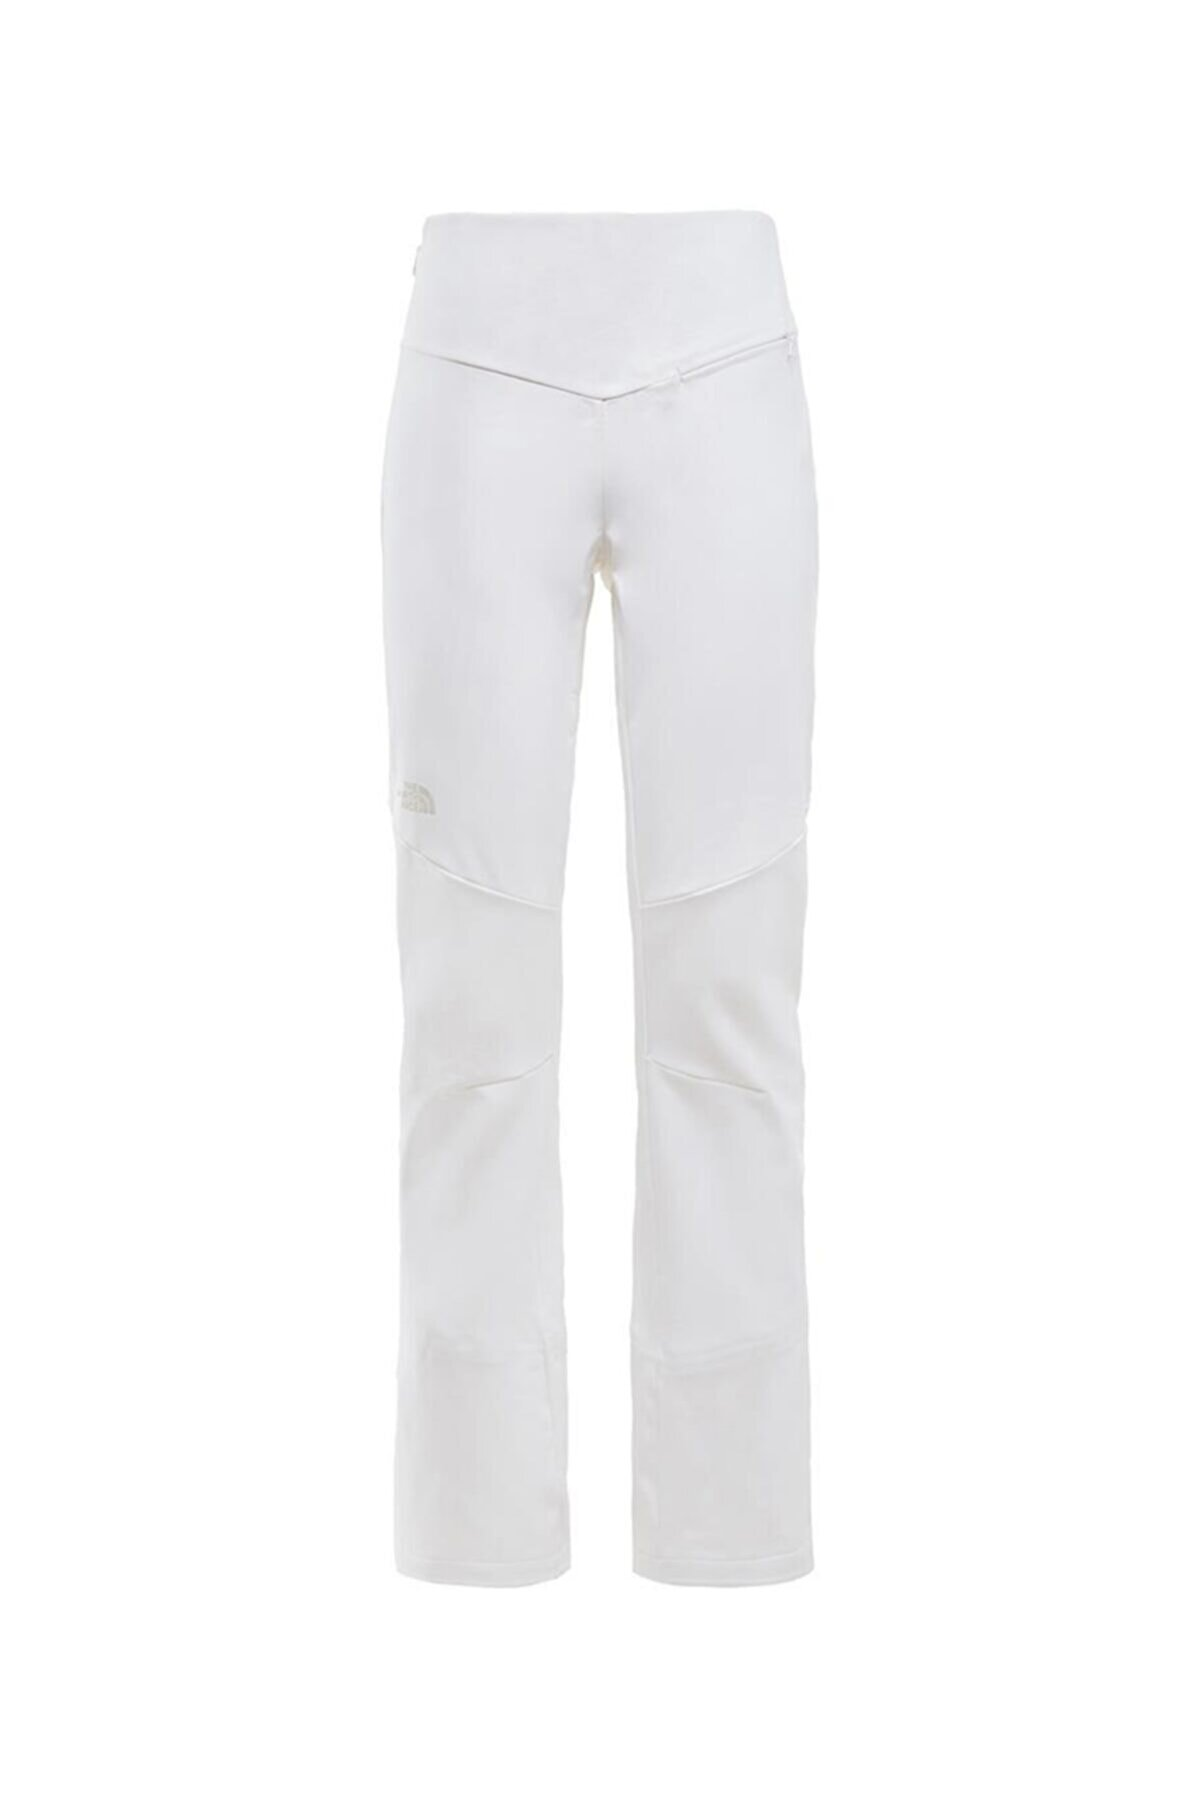 The North Face Snoga Kadın Pantolon Beyaz